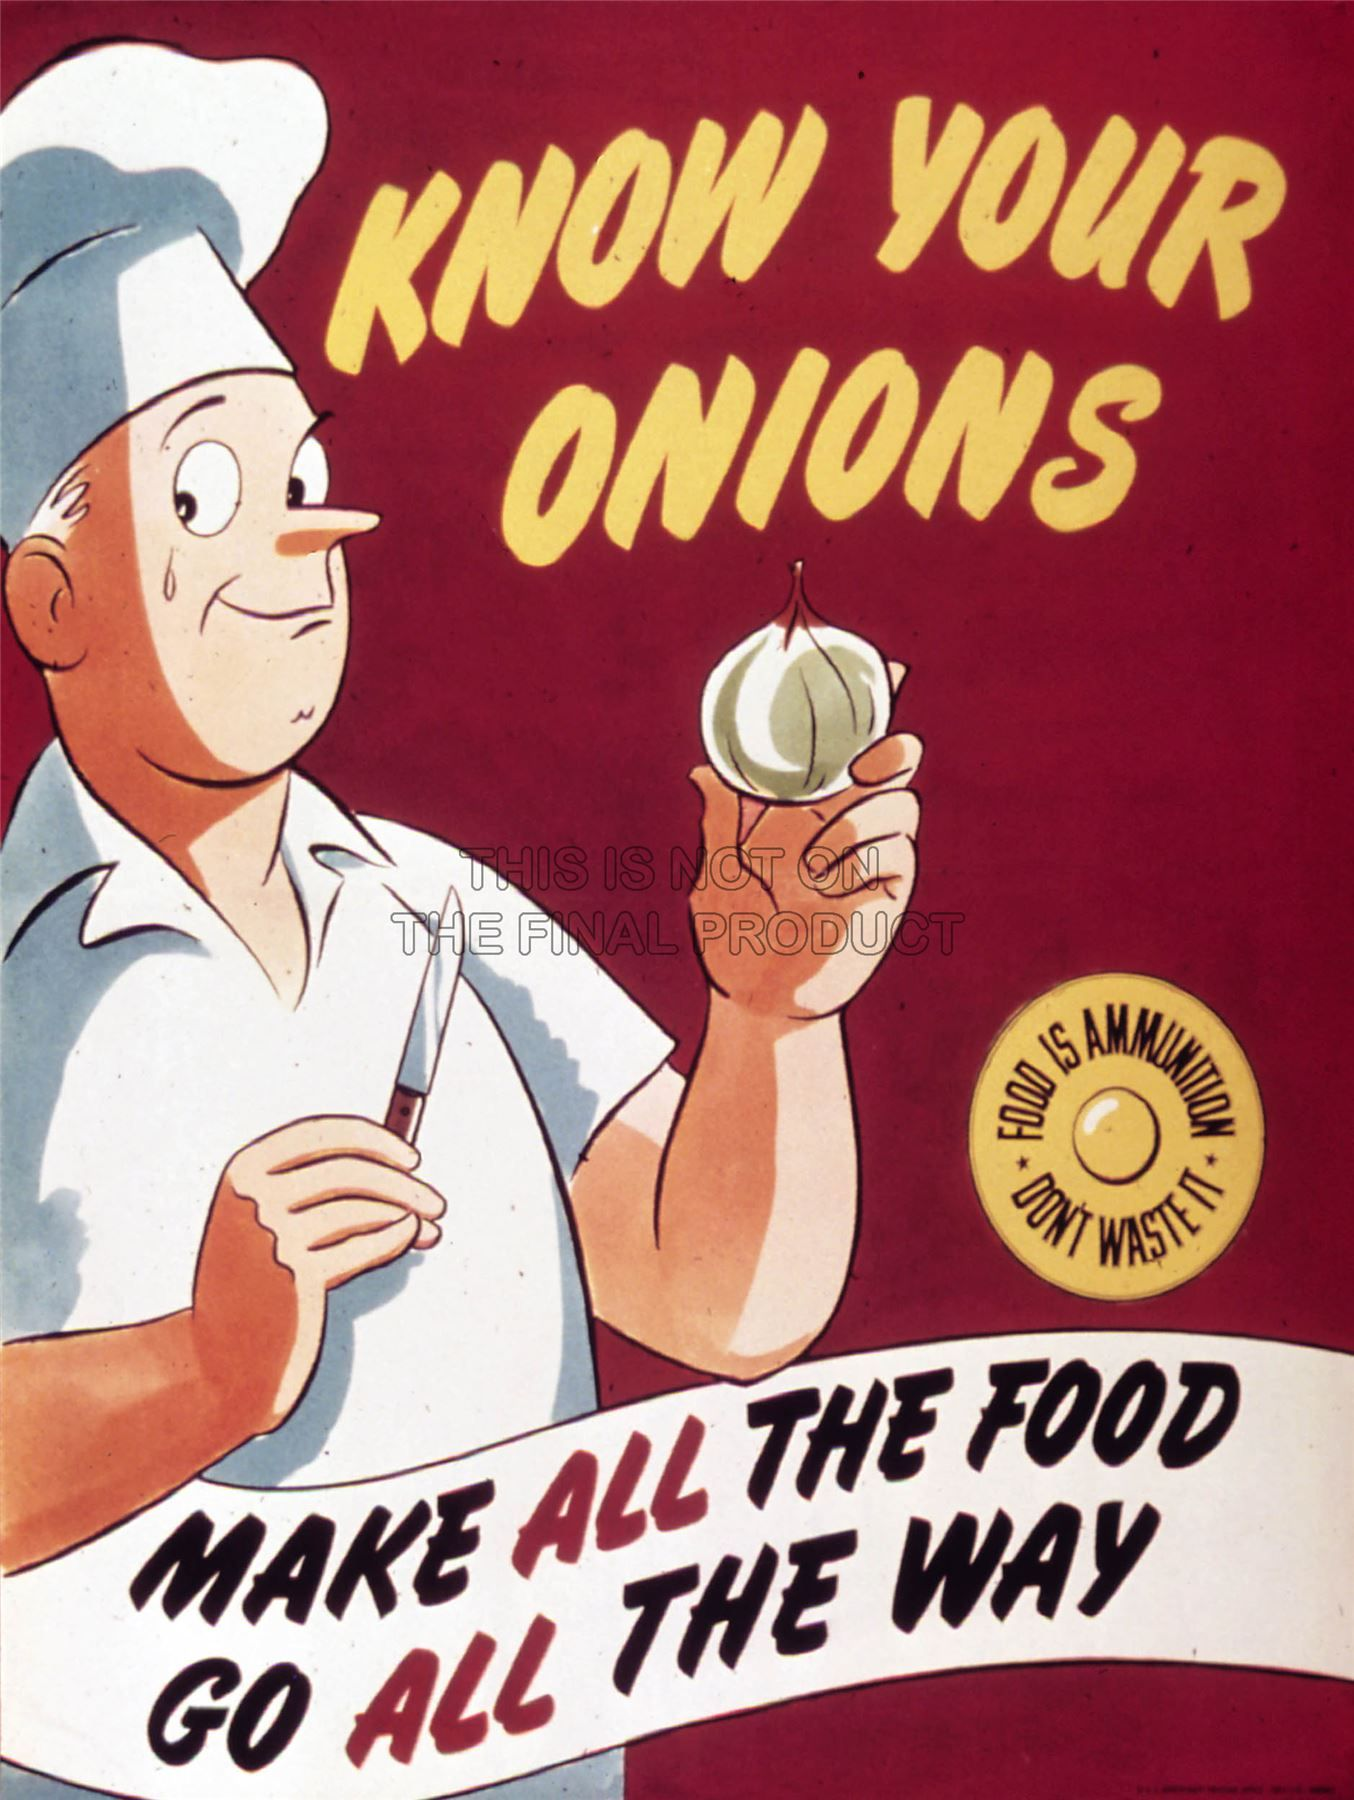 PROPAGANDA-WAR-WWII-USA-ONION-CHEF-SAVE-FOOD-FINE-ART-PRINT-POSTER-BB8323B